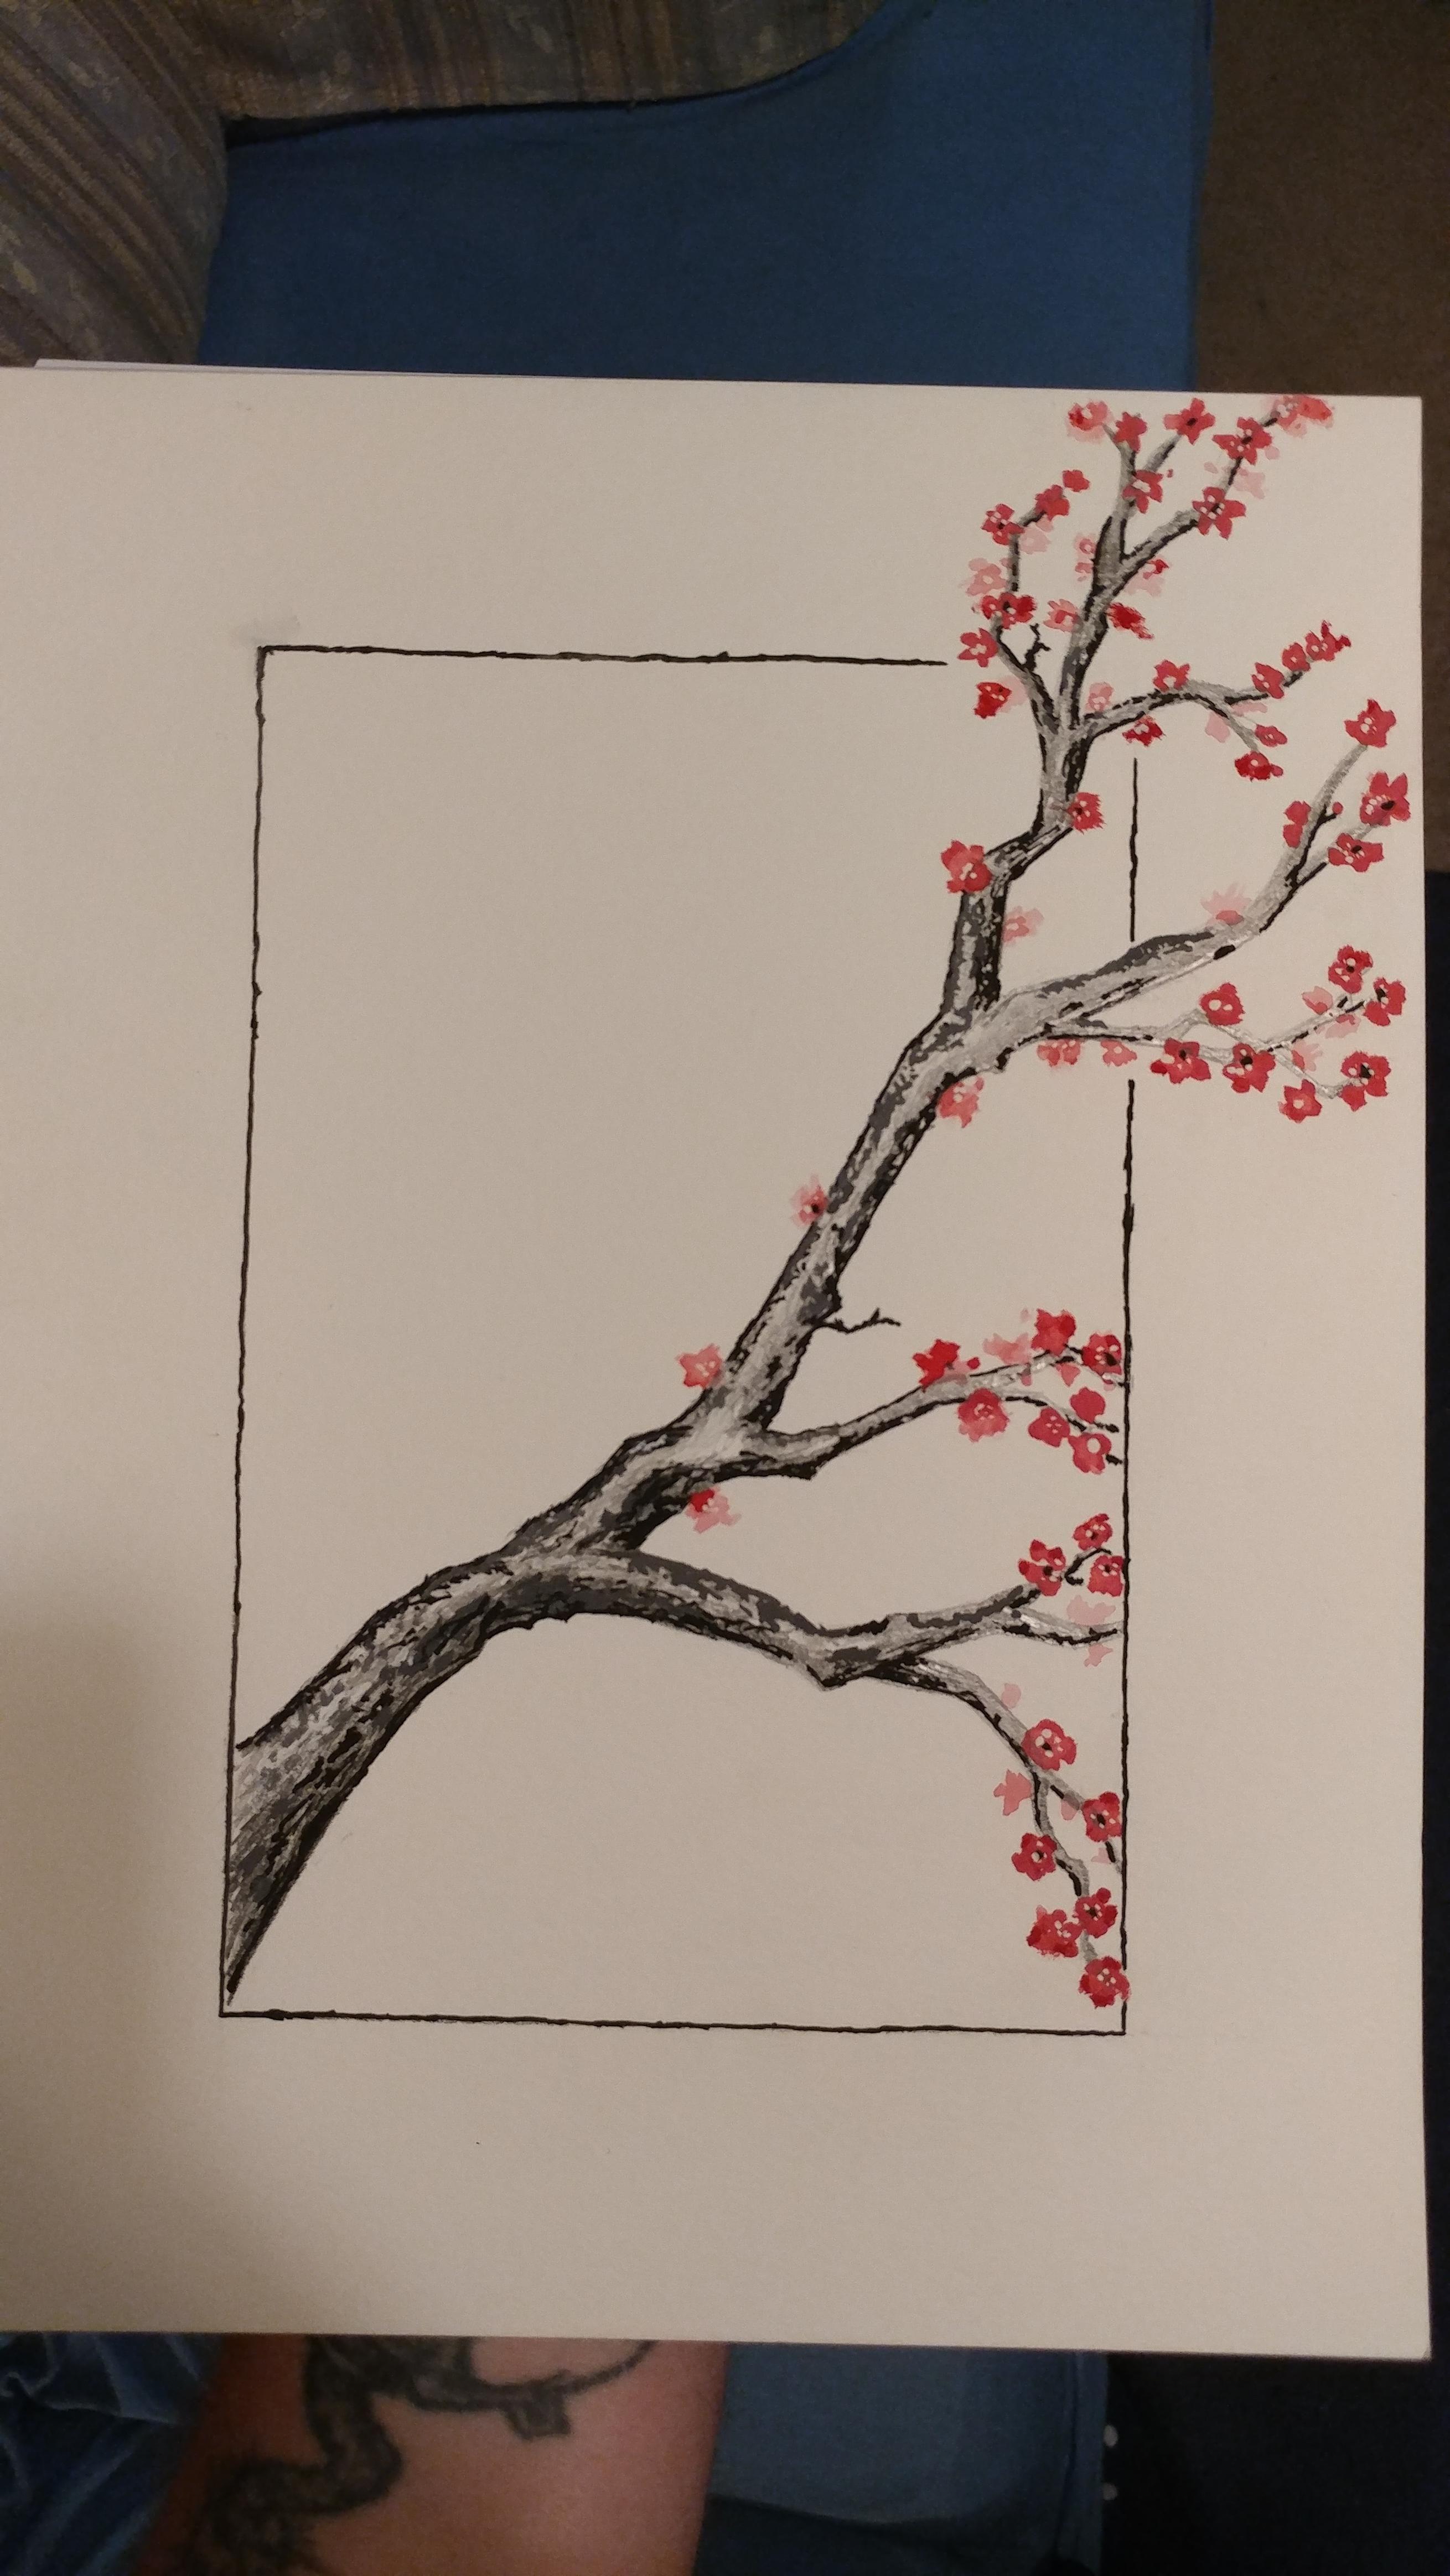 Cherry Blossom Tree By Emilyylime On Deviantart Tree Drawing Cherry Blossom Tree Tree Drawings Pencil